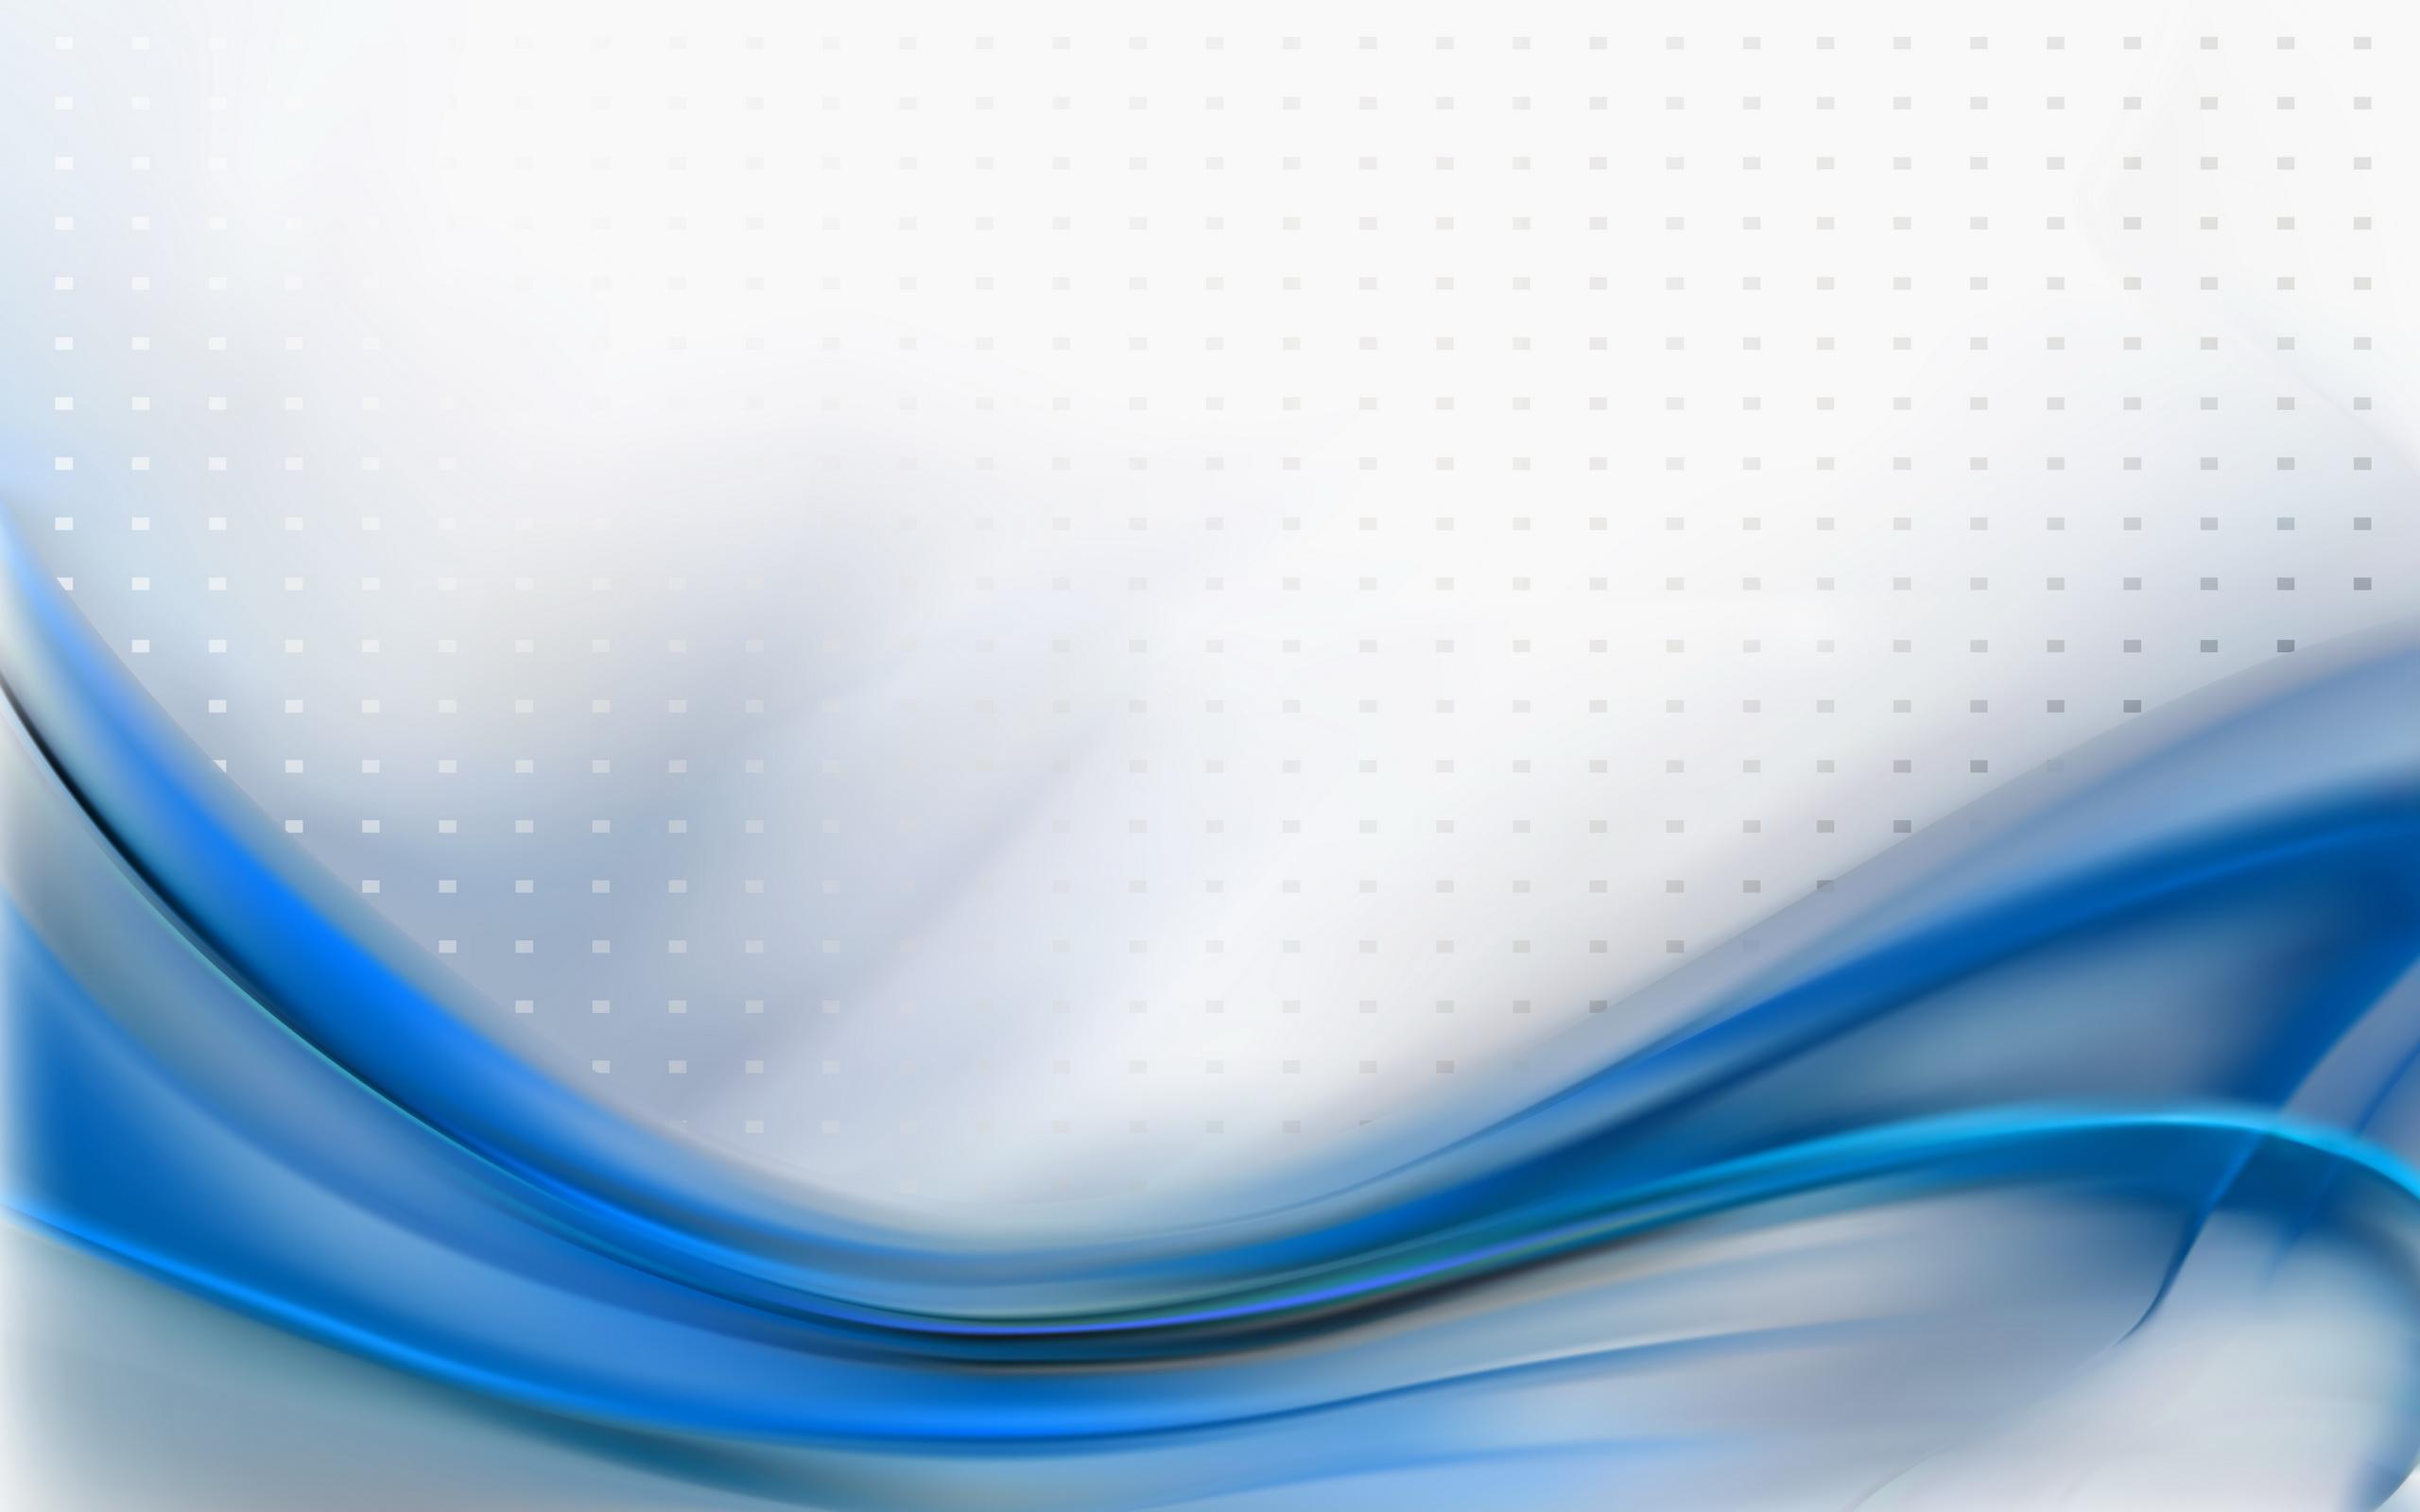 Blue Vector Backgrounds wallpaper   1099327 2560x1600